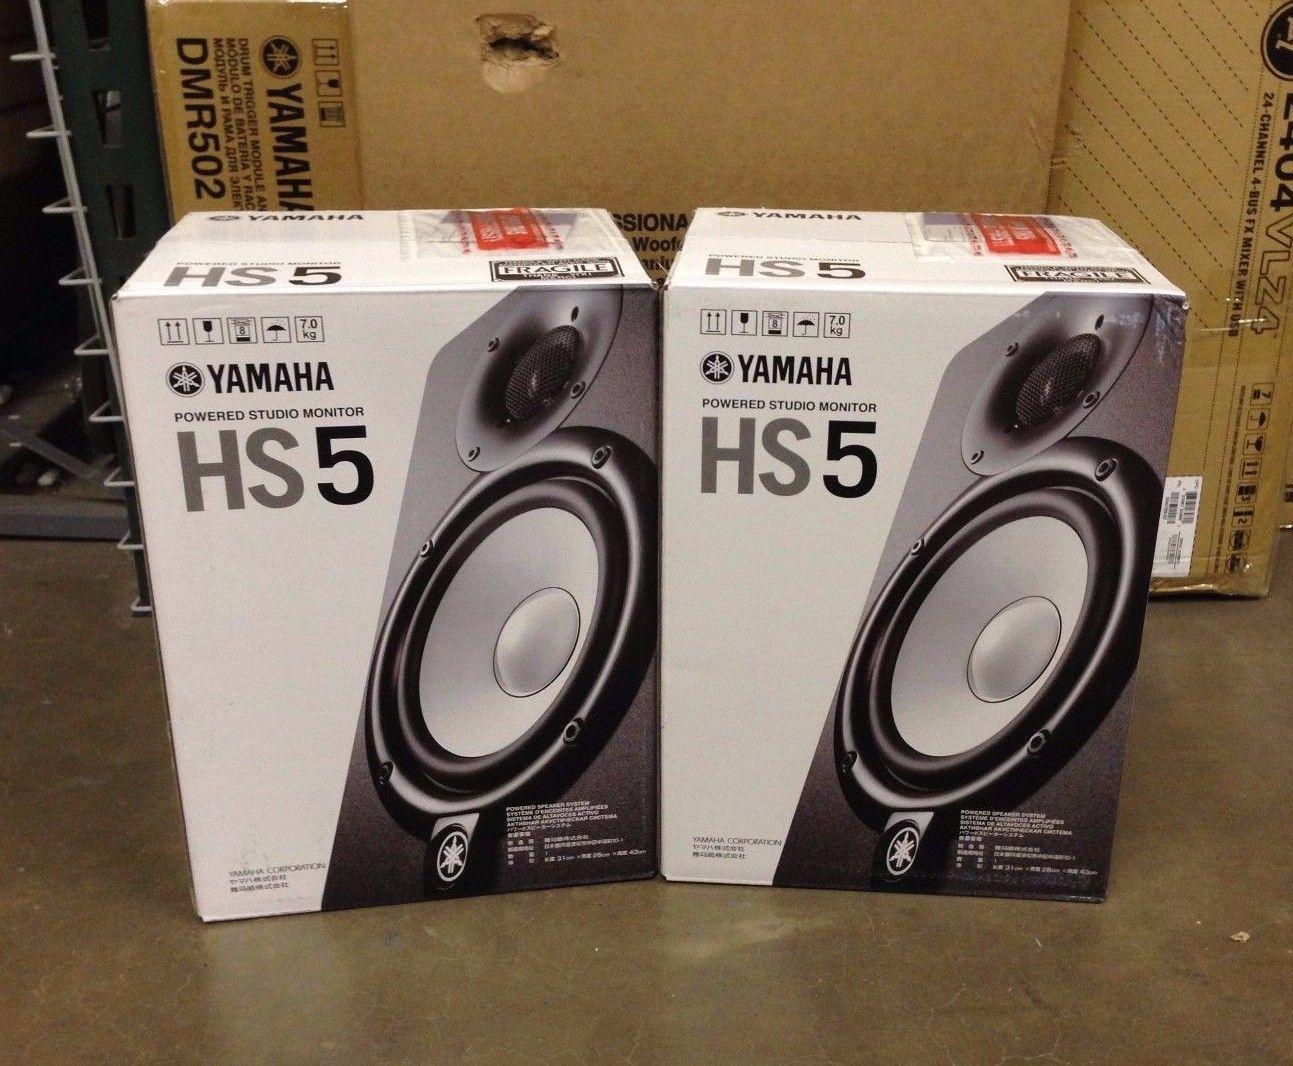 Yamaha Hs5 Powered Studio Monitor Pair 5 2 Way 70w Free Shipping